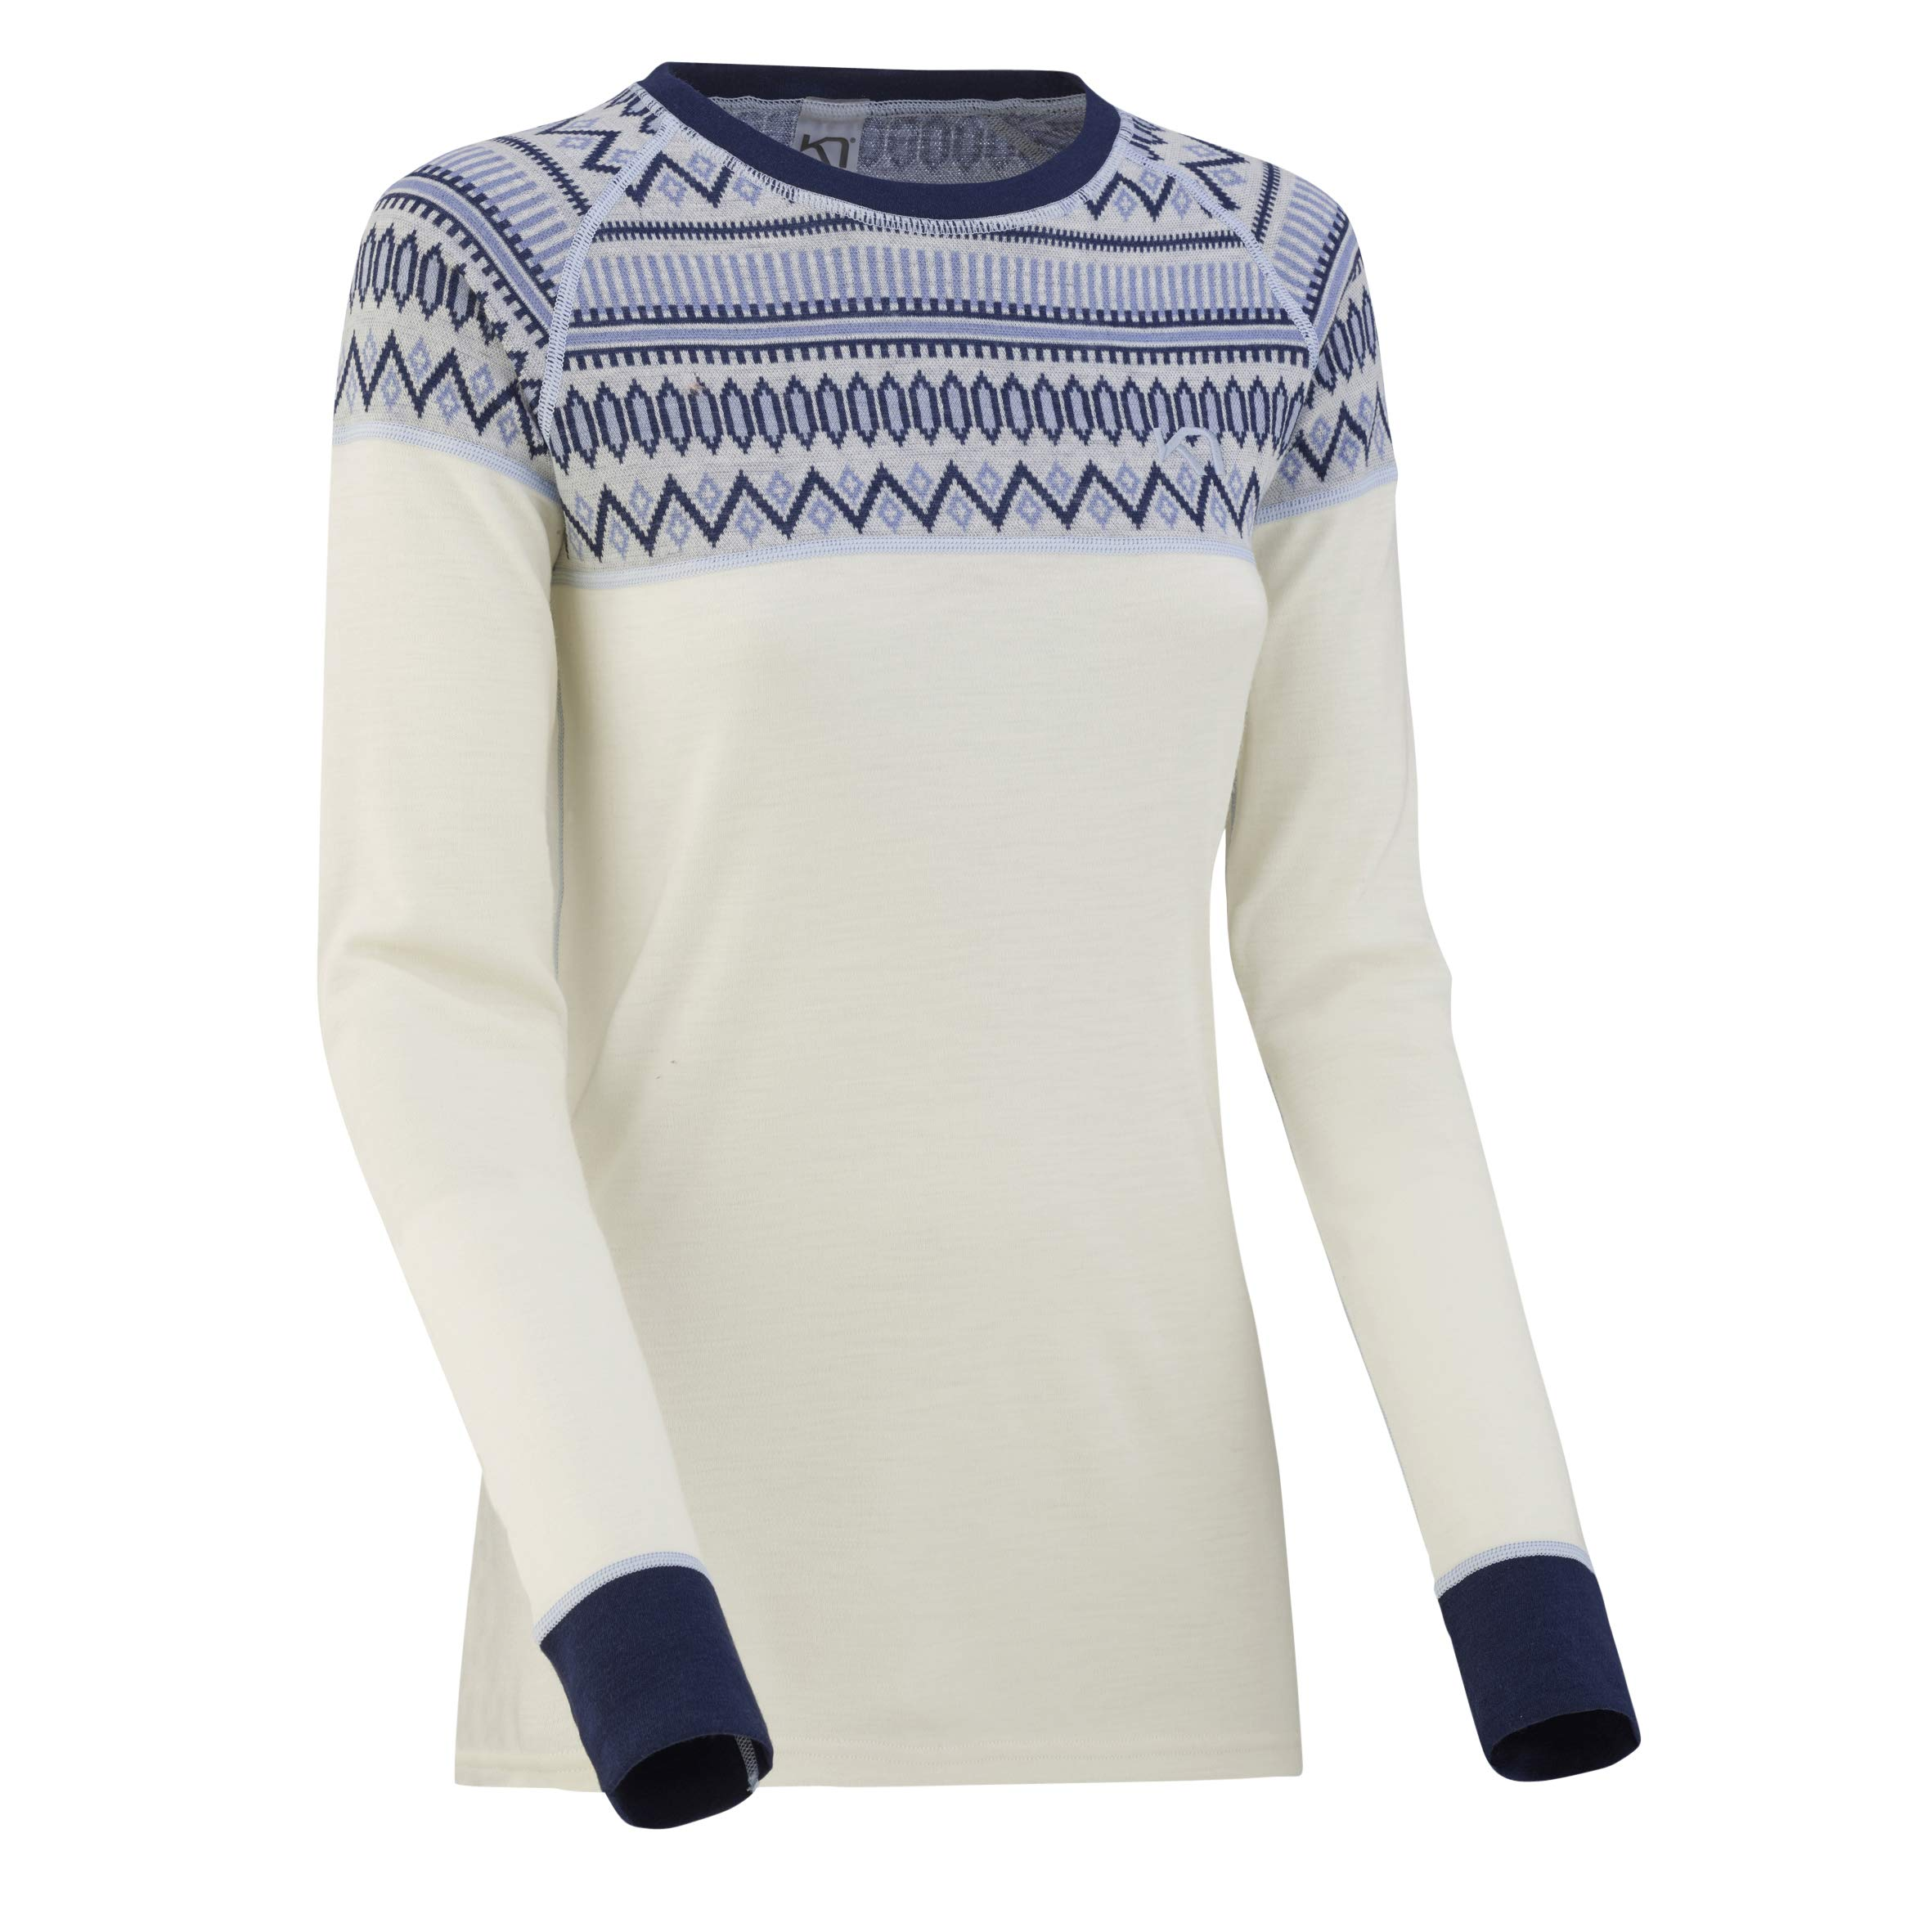 Kari Traa Women's Lokke Base Layer Top - Long Sleeve 100% Merino Wool Thermal Shirt